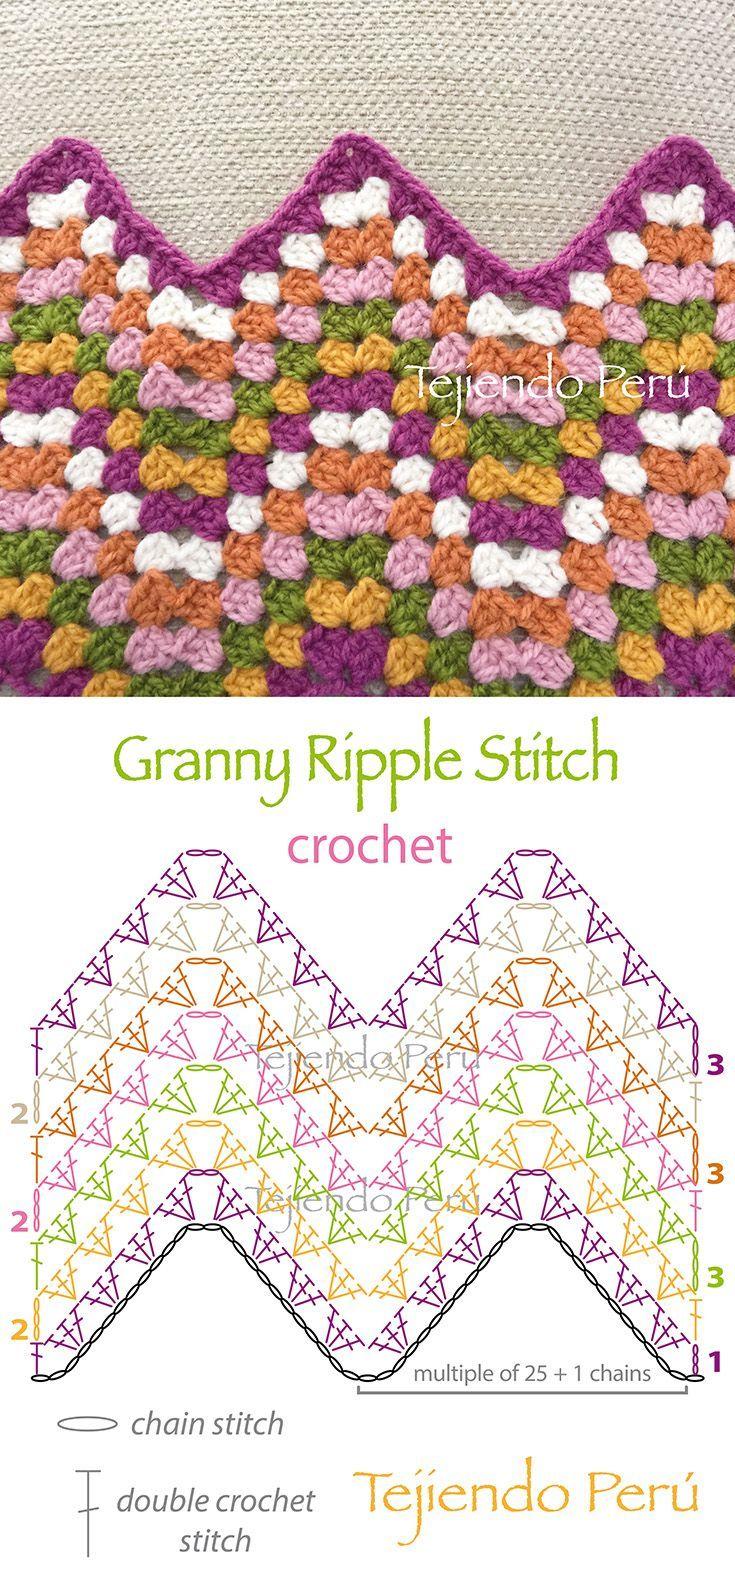 Crochet Granny Ripple Stitch Diagram Or Pattern Easy Double